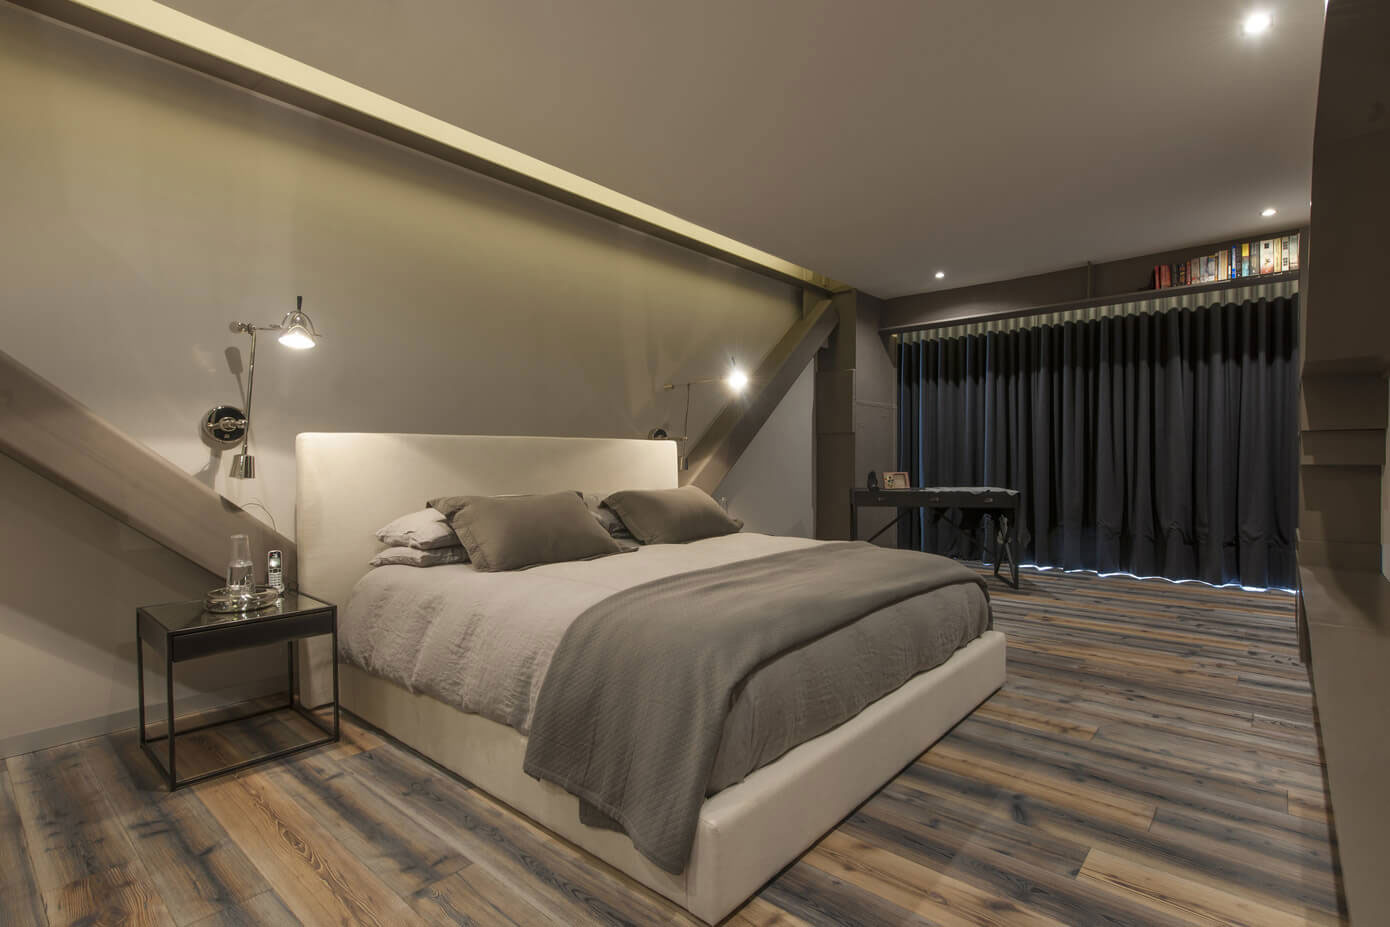 Contemporary cm apartment in mexico city by kababie - Cm arquitectos ...